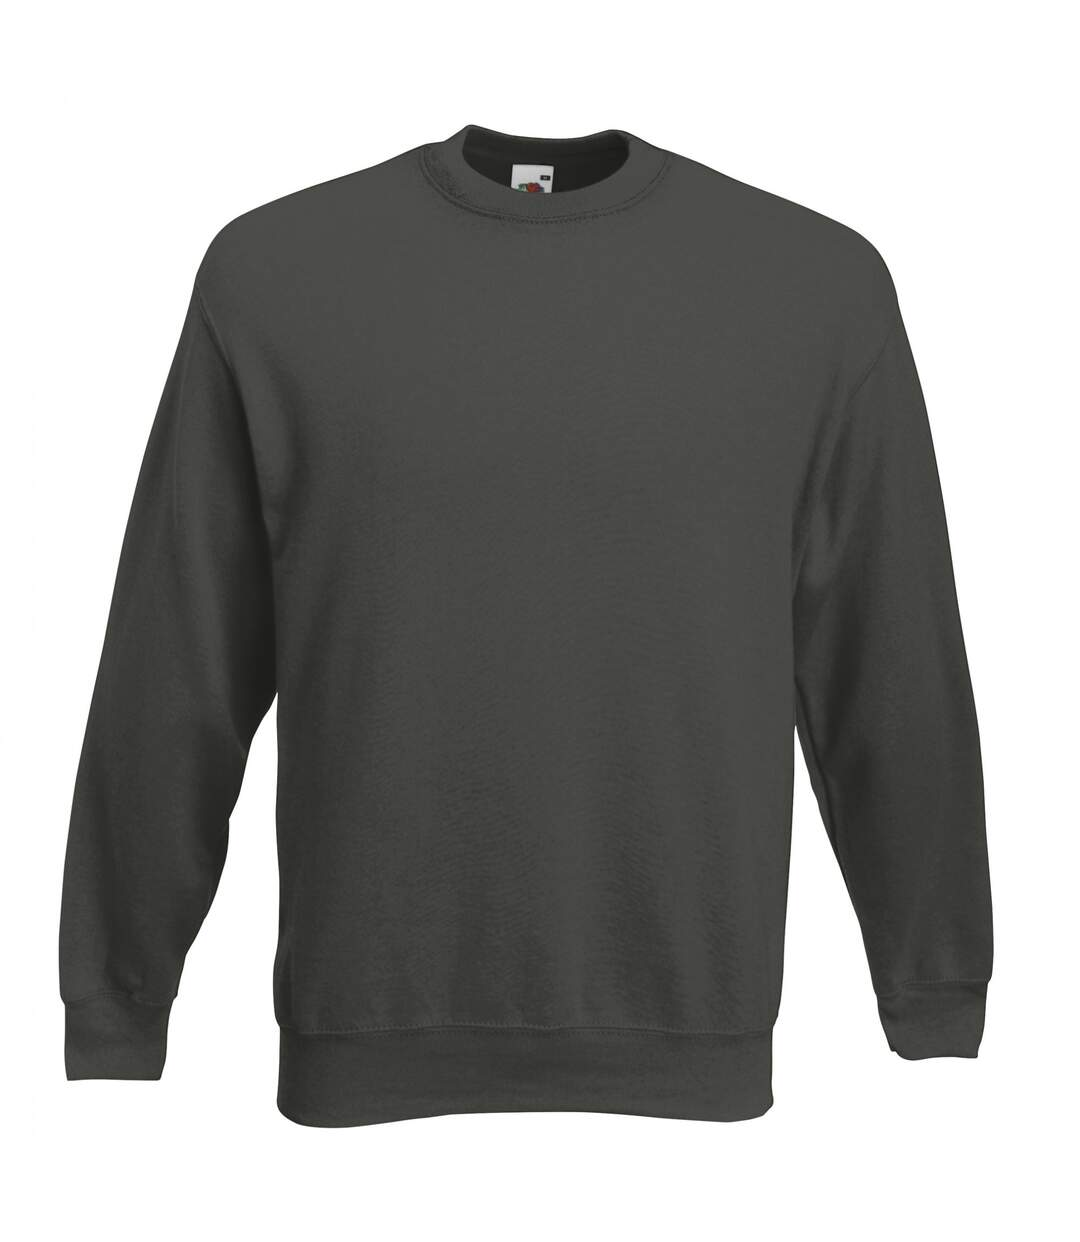 Fruit Of The Loom Unisex Premium 70/30 Set-In Sweatshirt (Charcoal) - UTRW3159